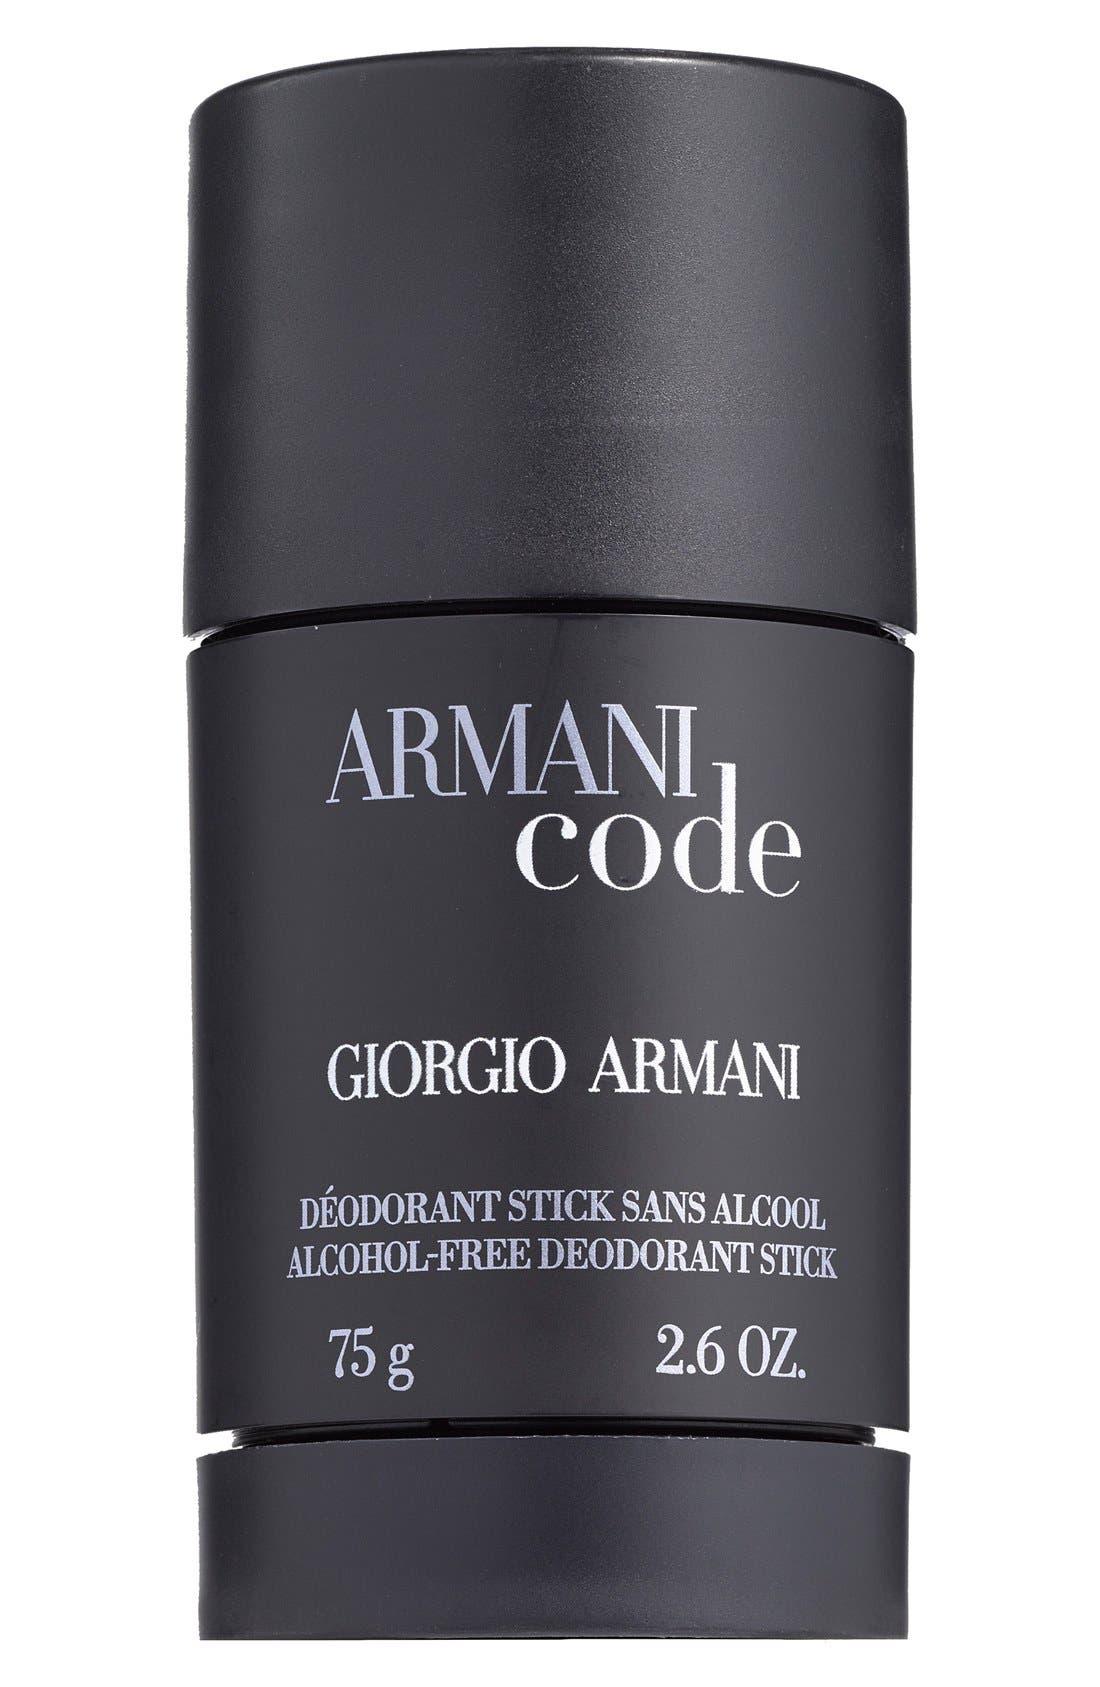 Armani Code Deodorant